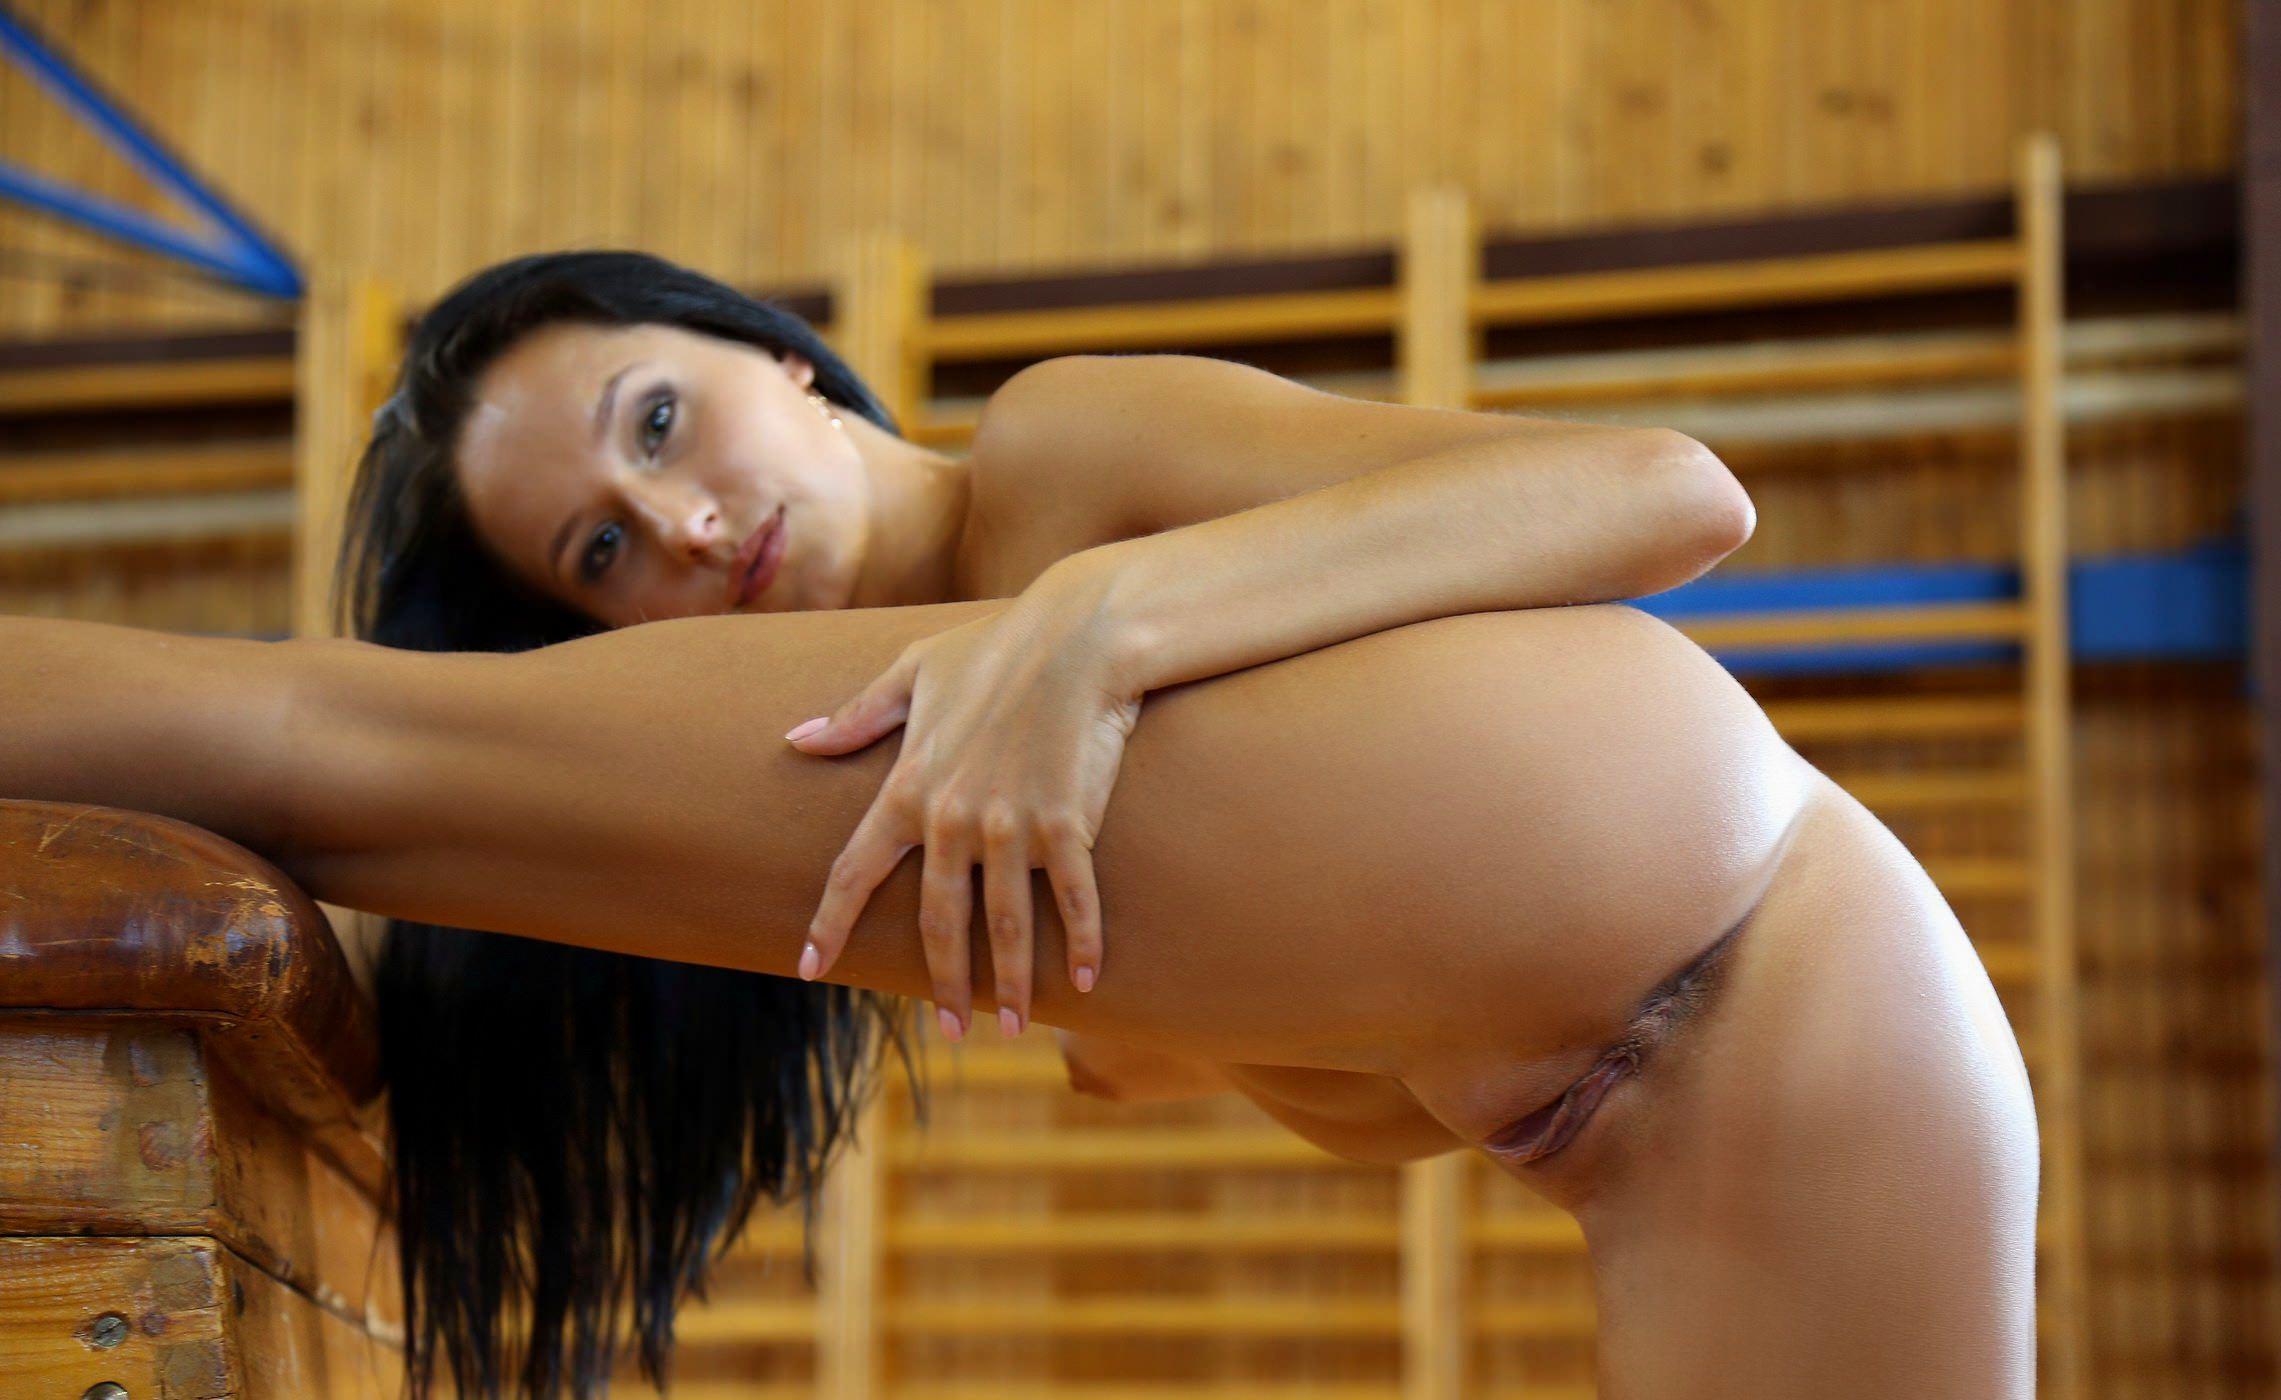 растяжка голые девушки фото